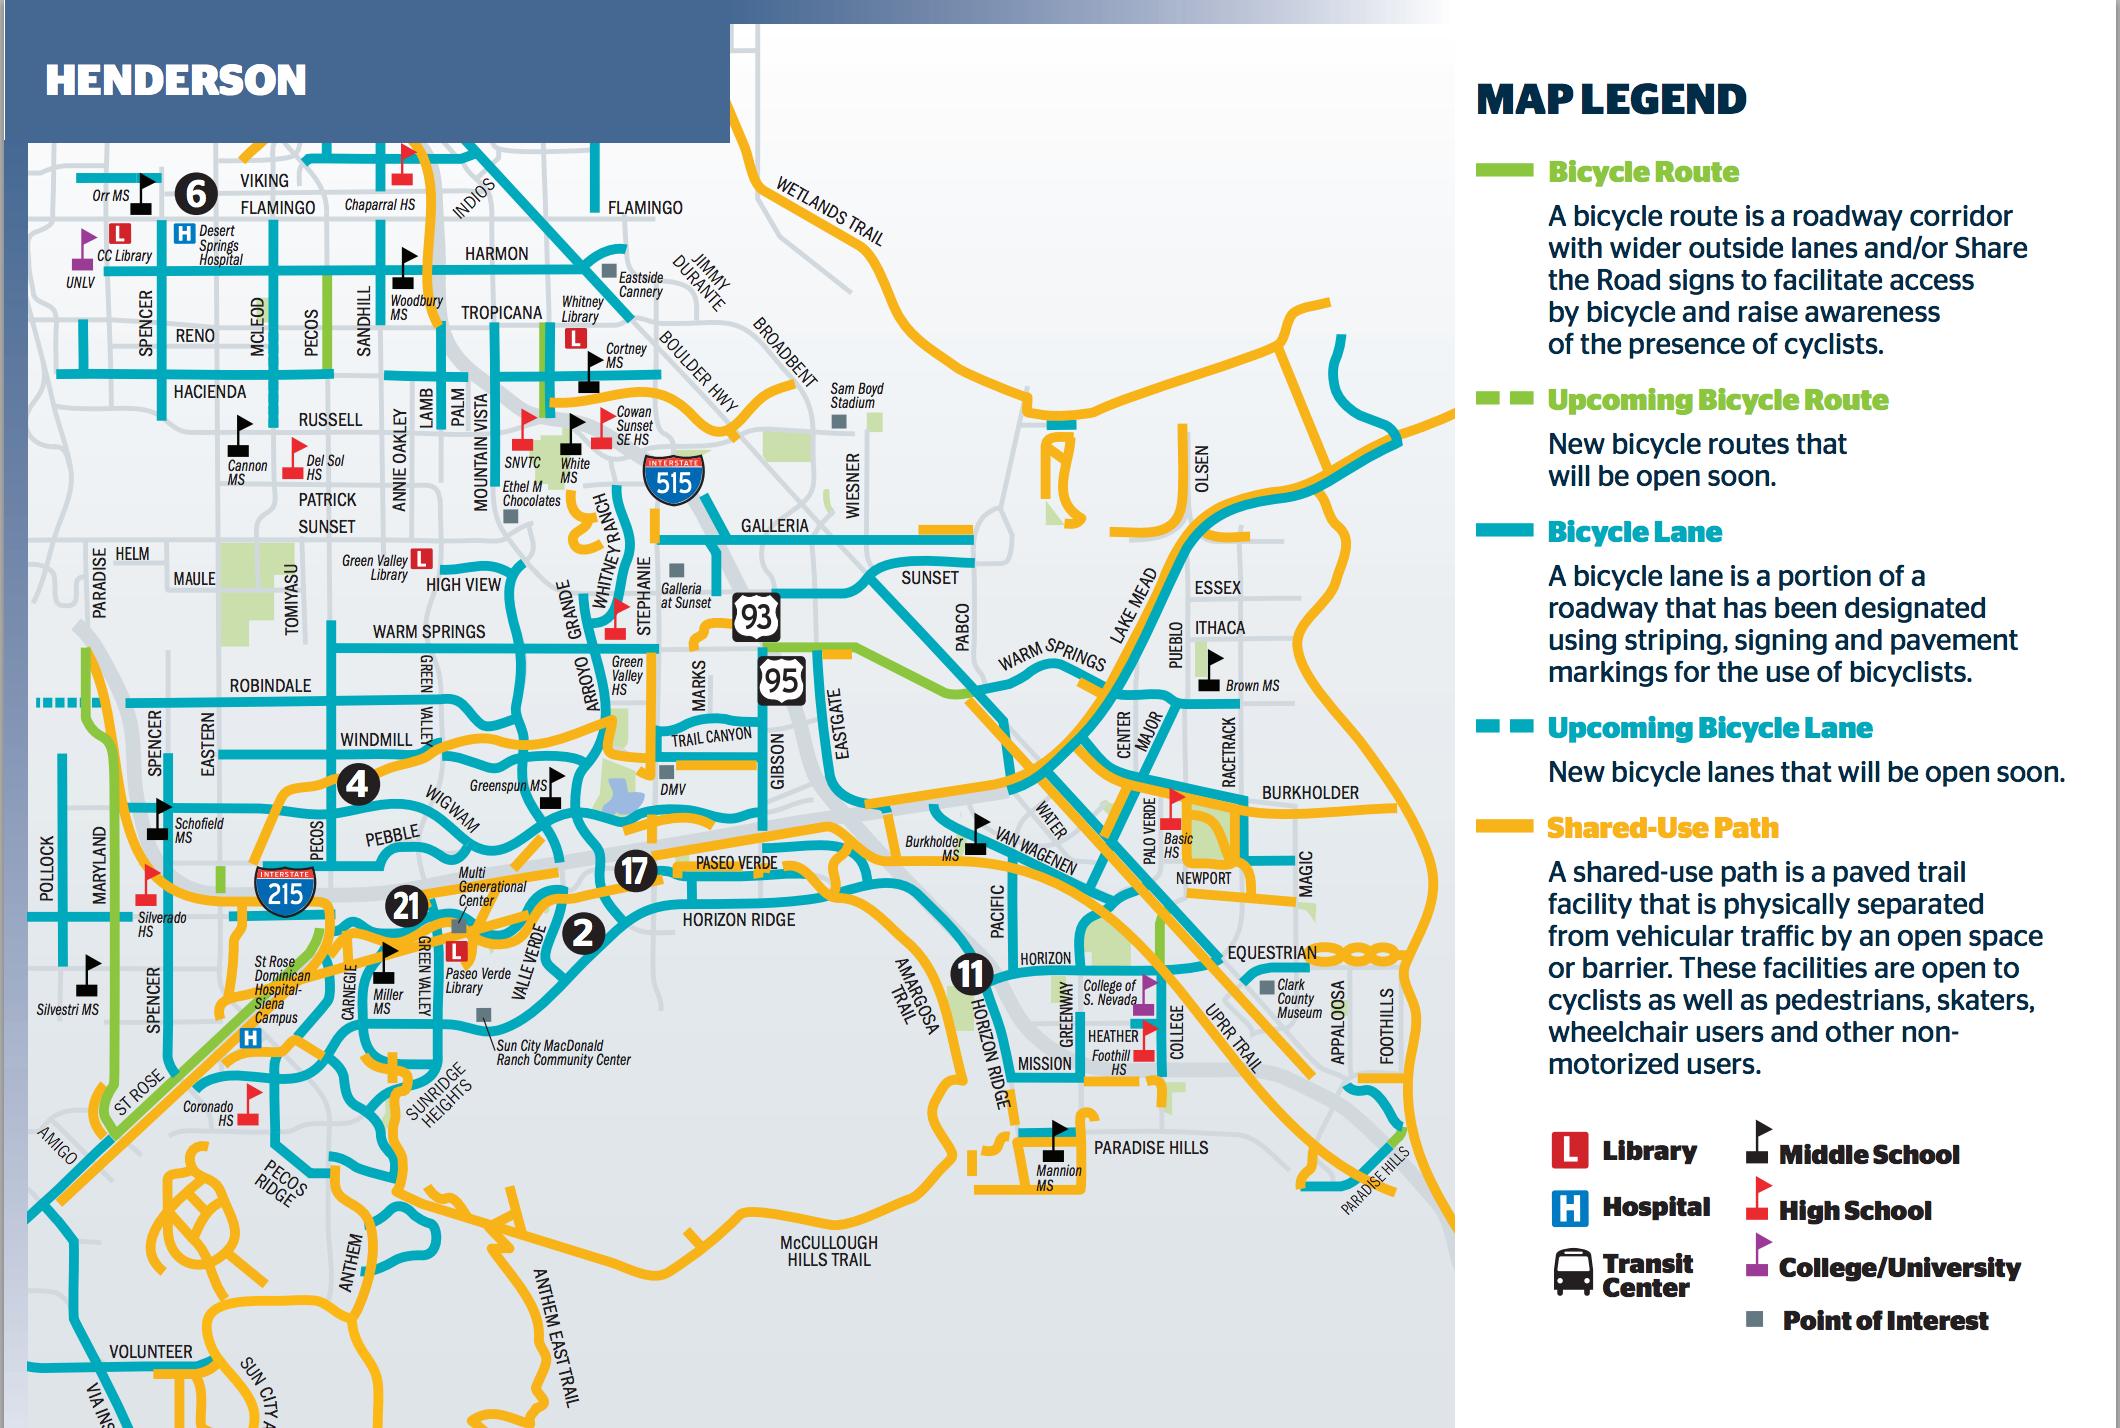 A bike map of Henderson